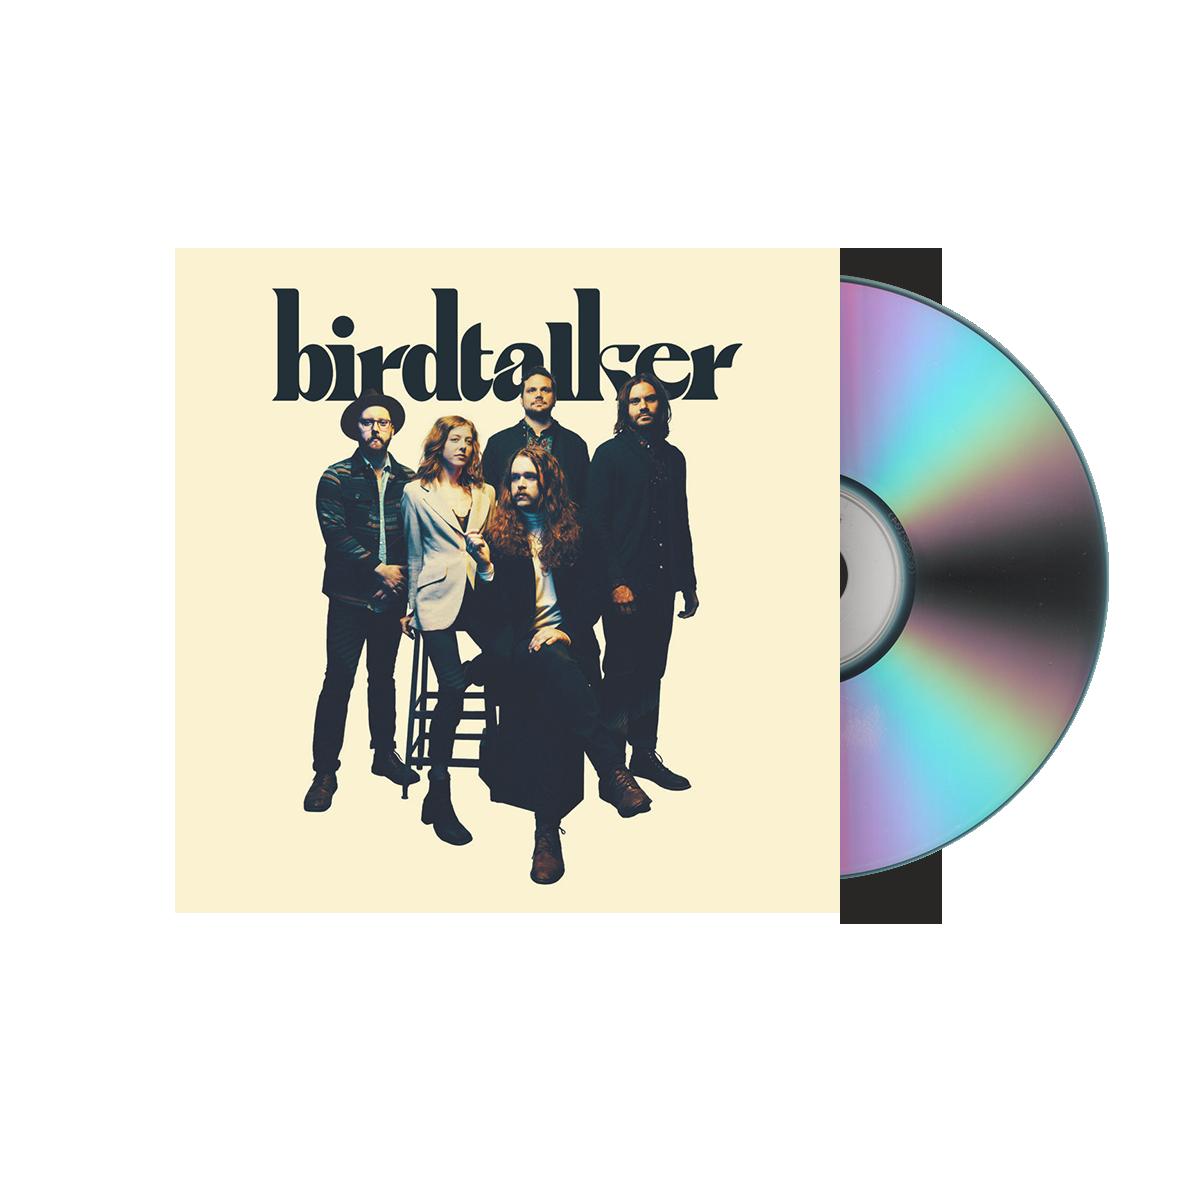 Birdtalker CD, Tee & Pin Bundle